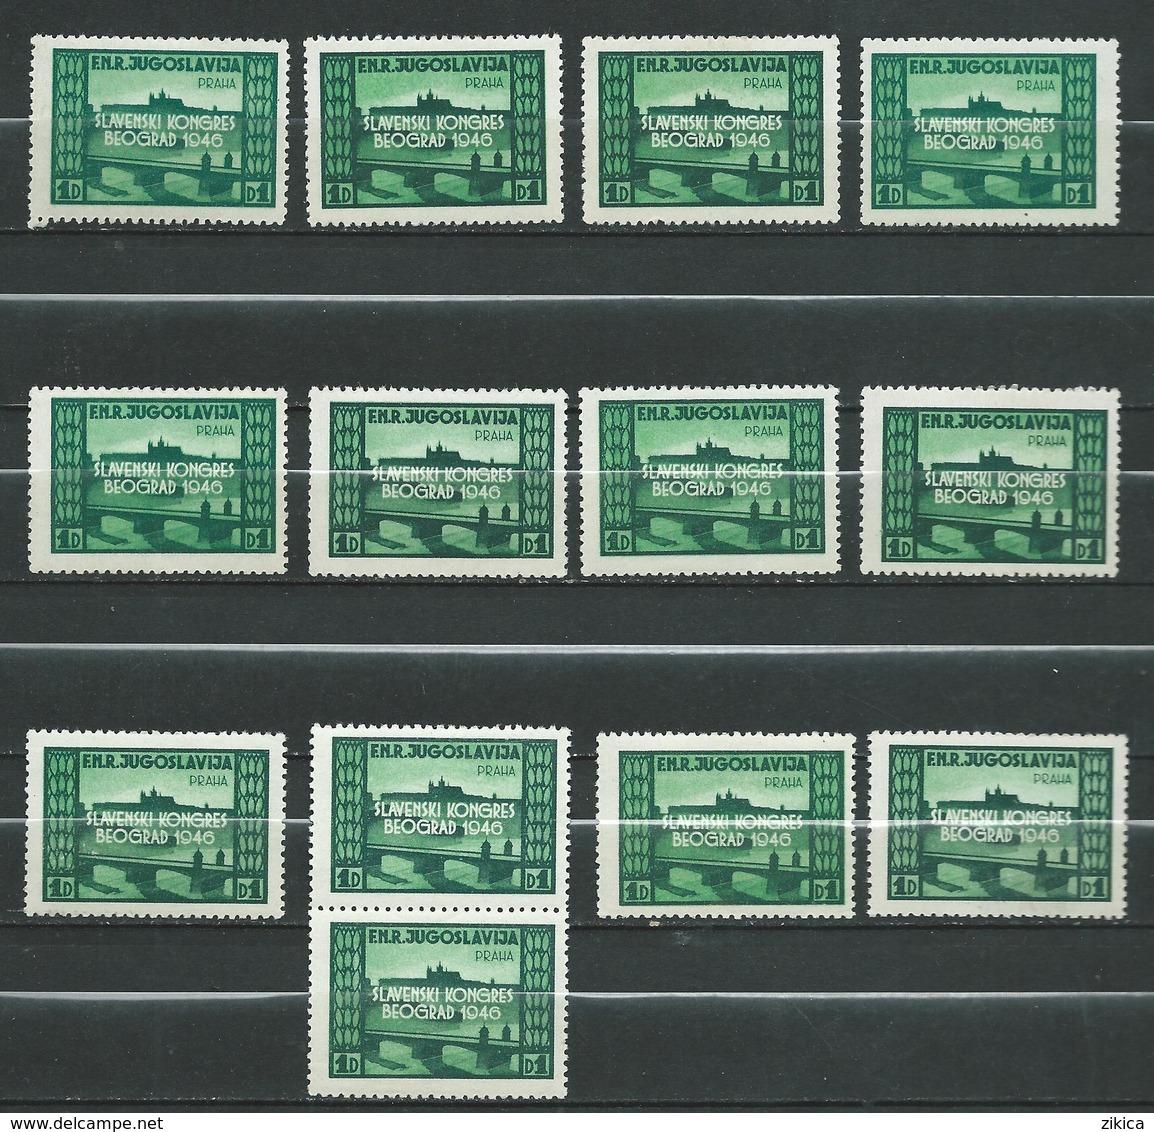 Yugoslavia 1948 Slav Congress - Lot 13 Stamps - Prague Castle,Czech Republic - MNH** - Nuovi